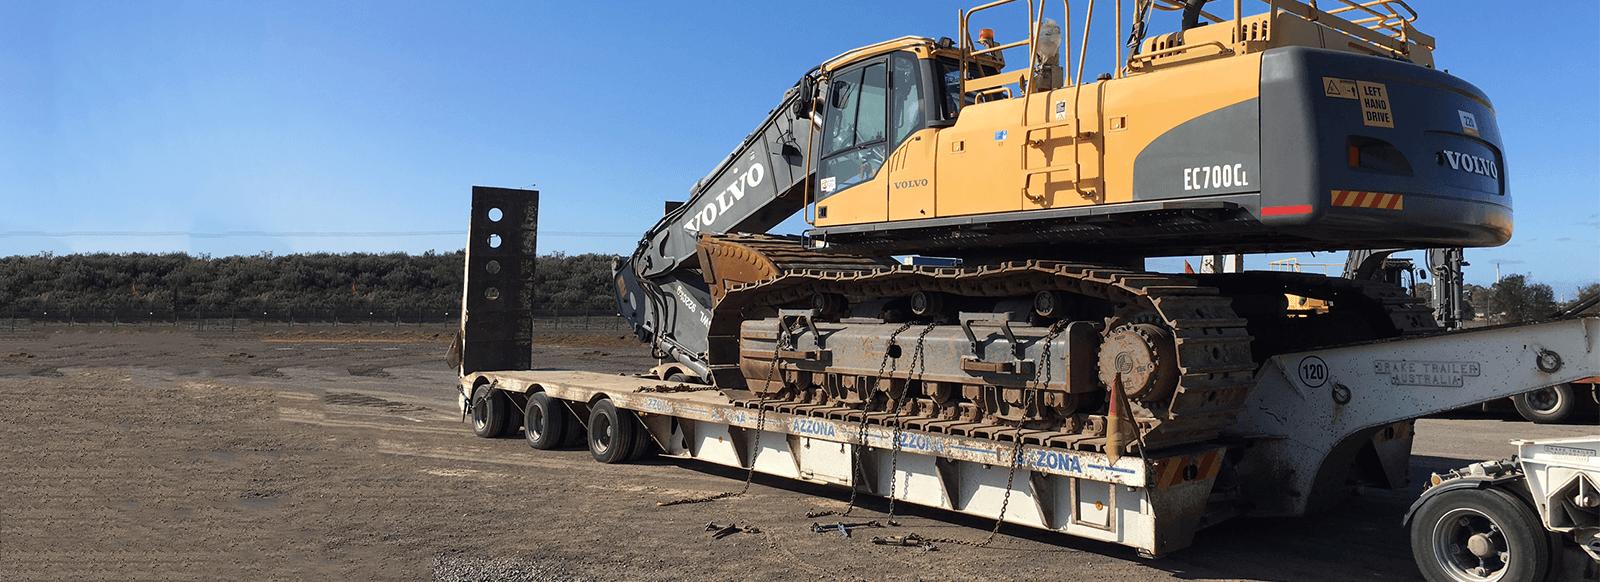 Paulls Construction Equipment Excavatpn float